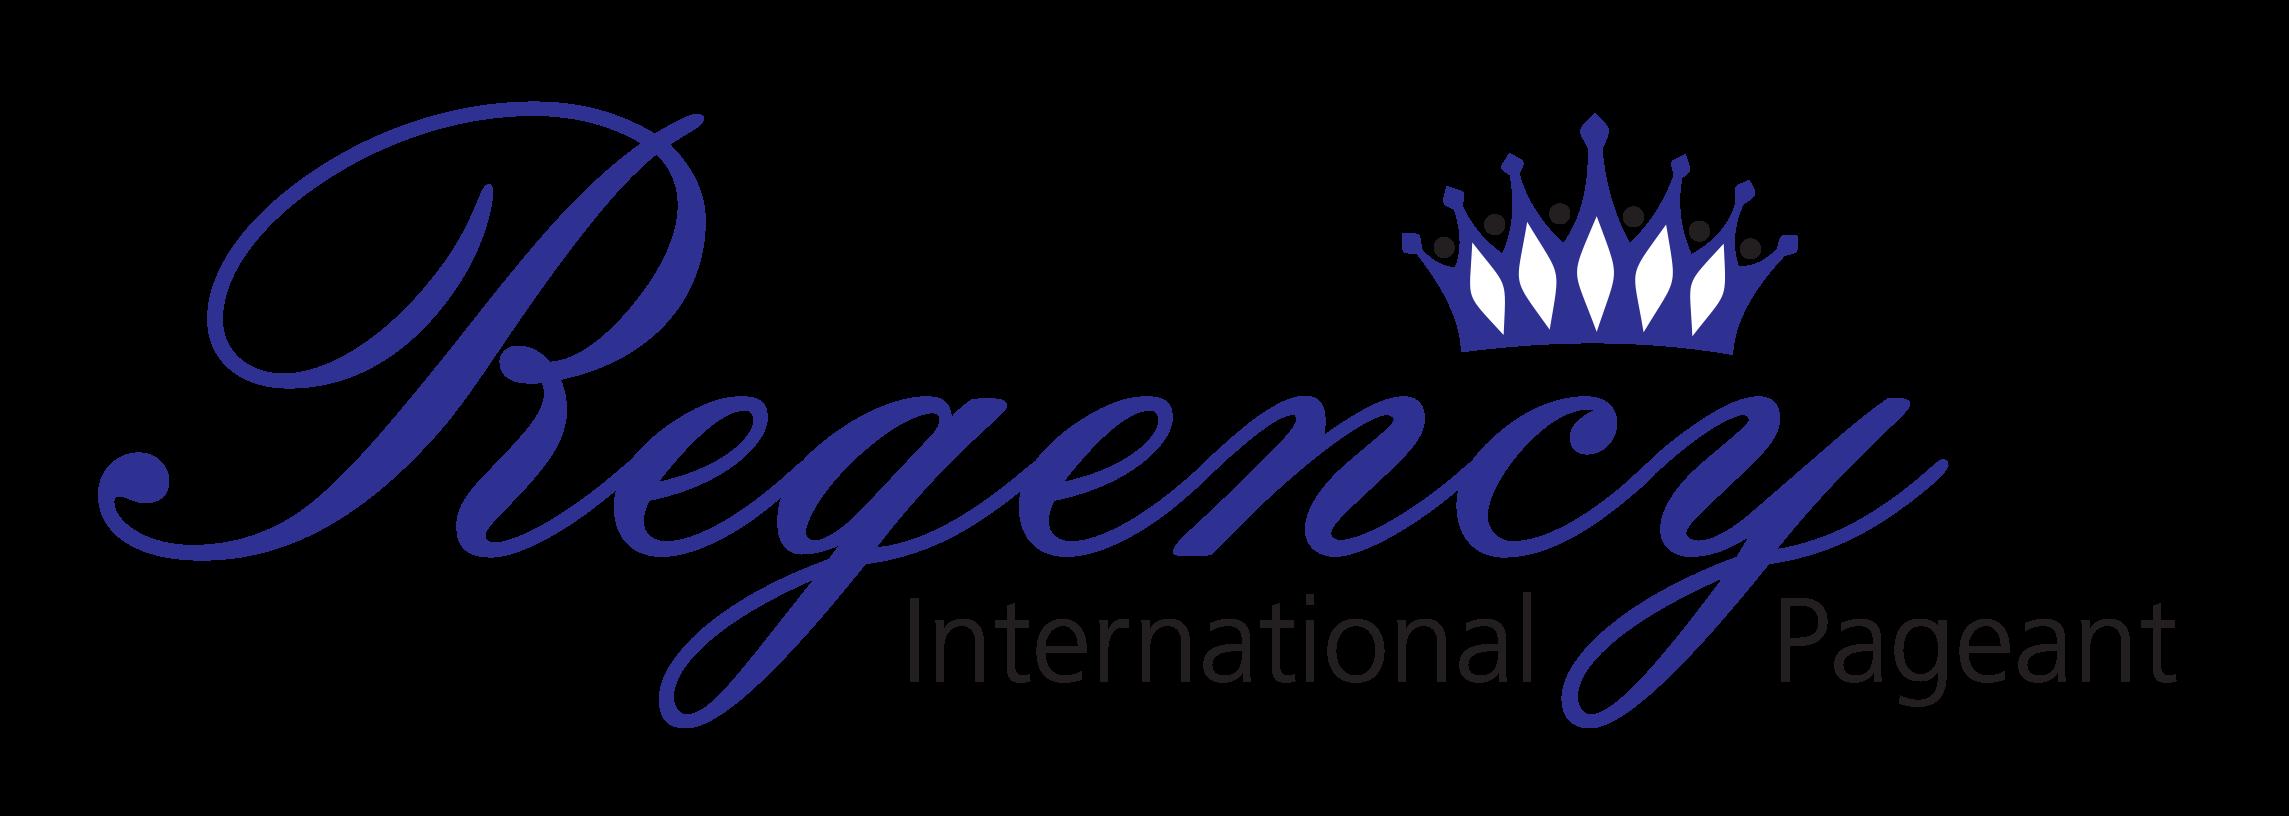 Petfest 2016 Tomball TX -  Regency International Pageant